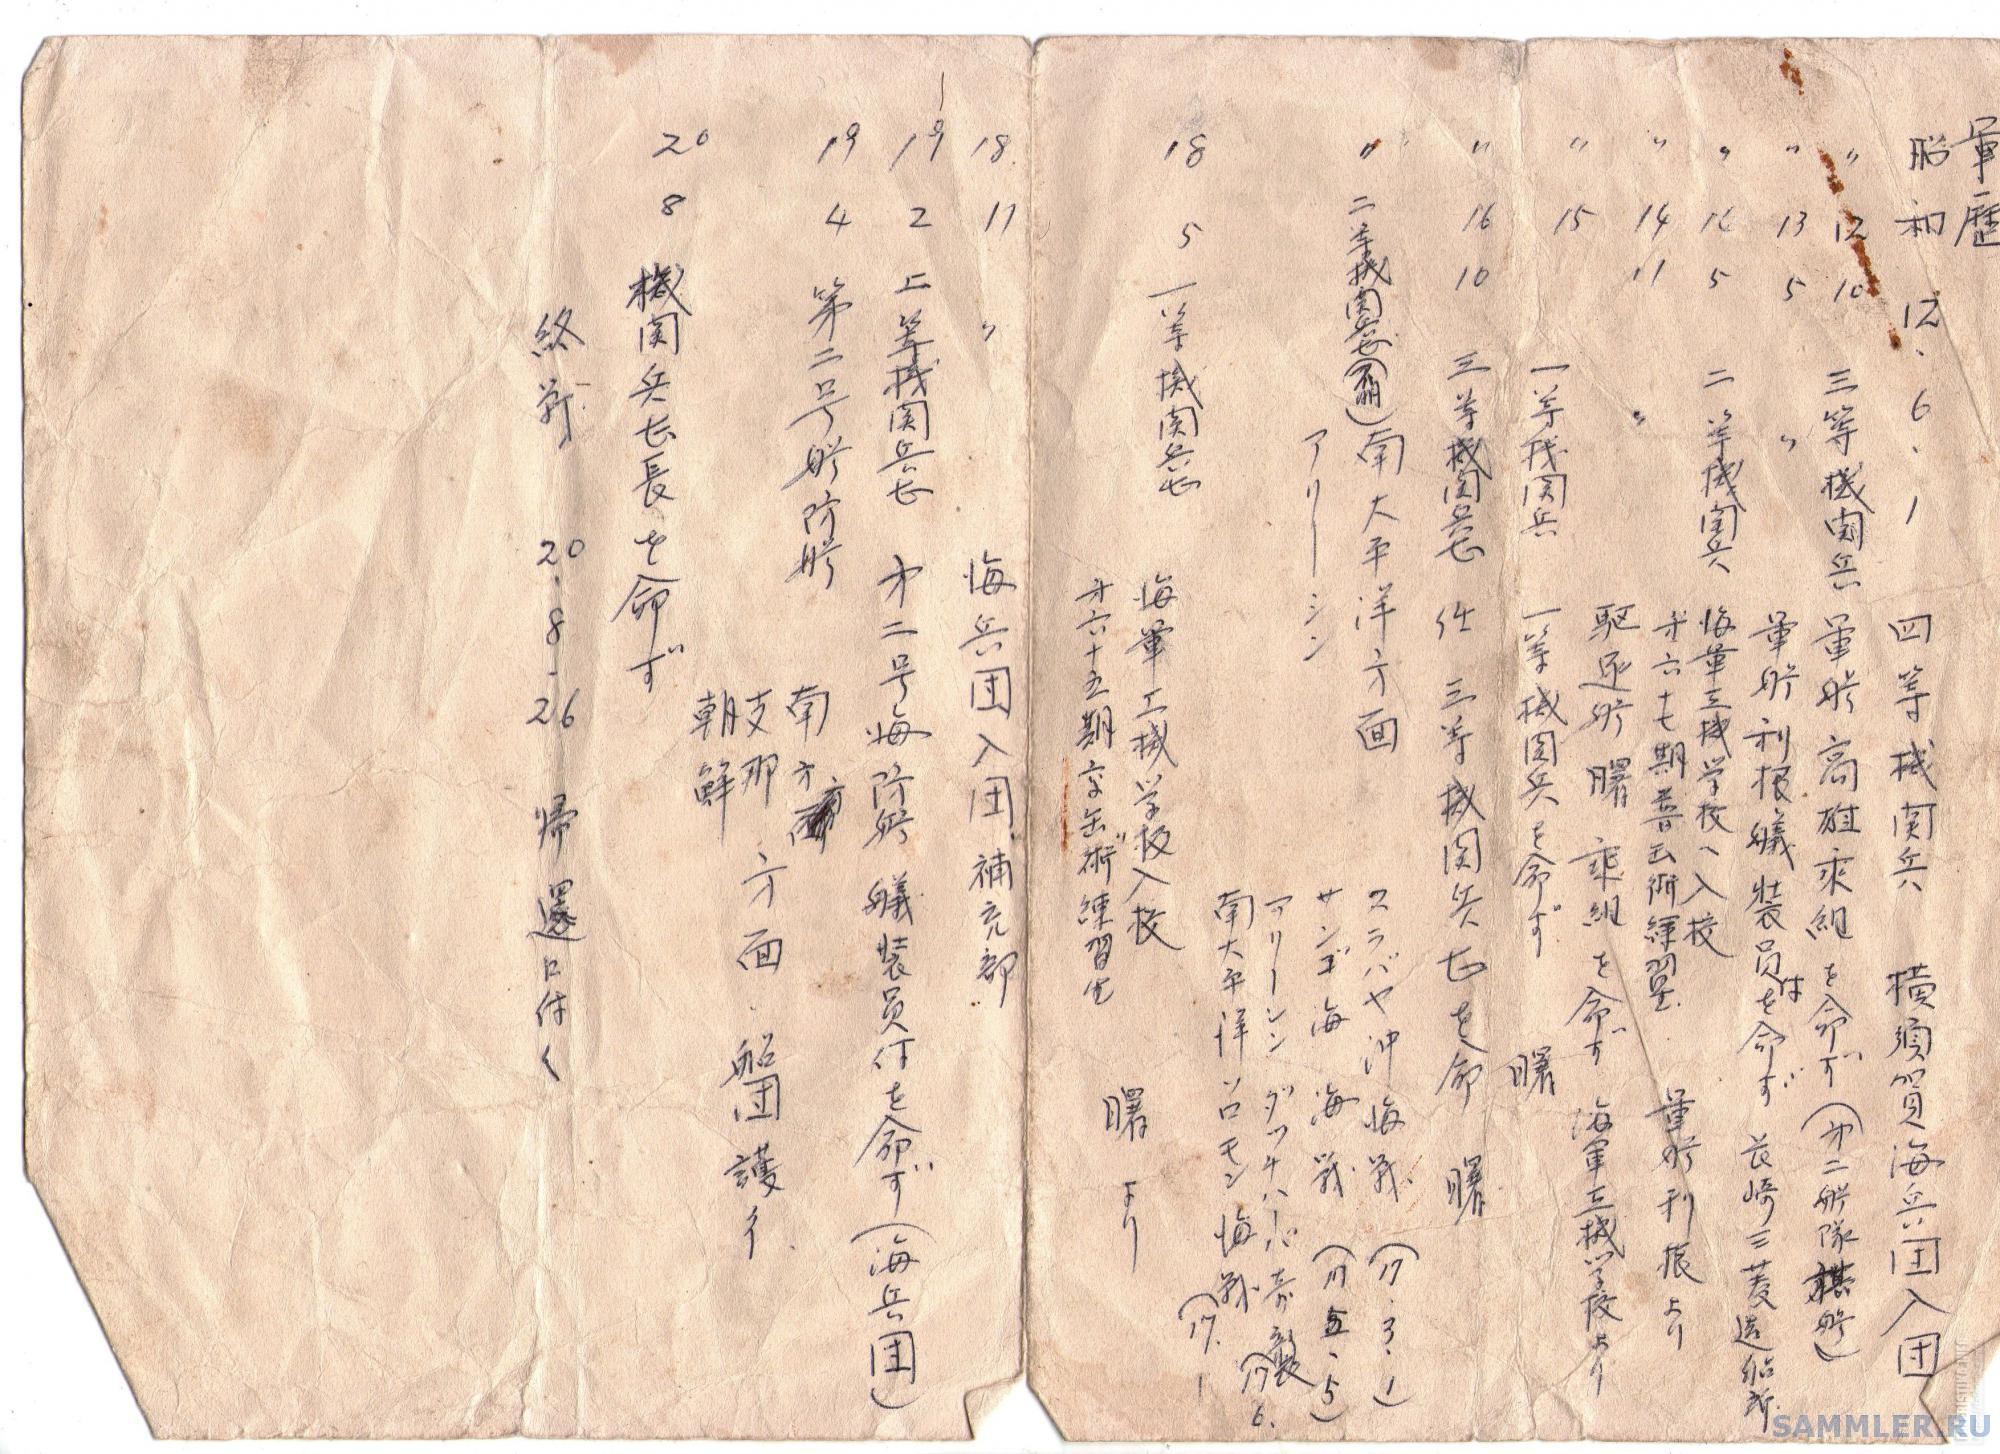 Jap005.jpg